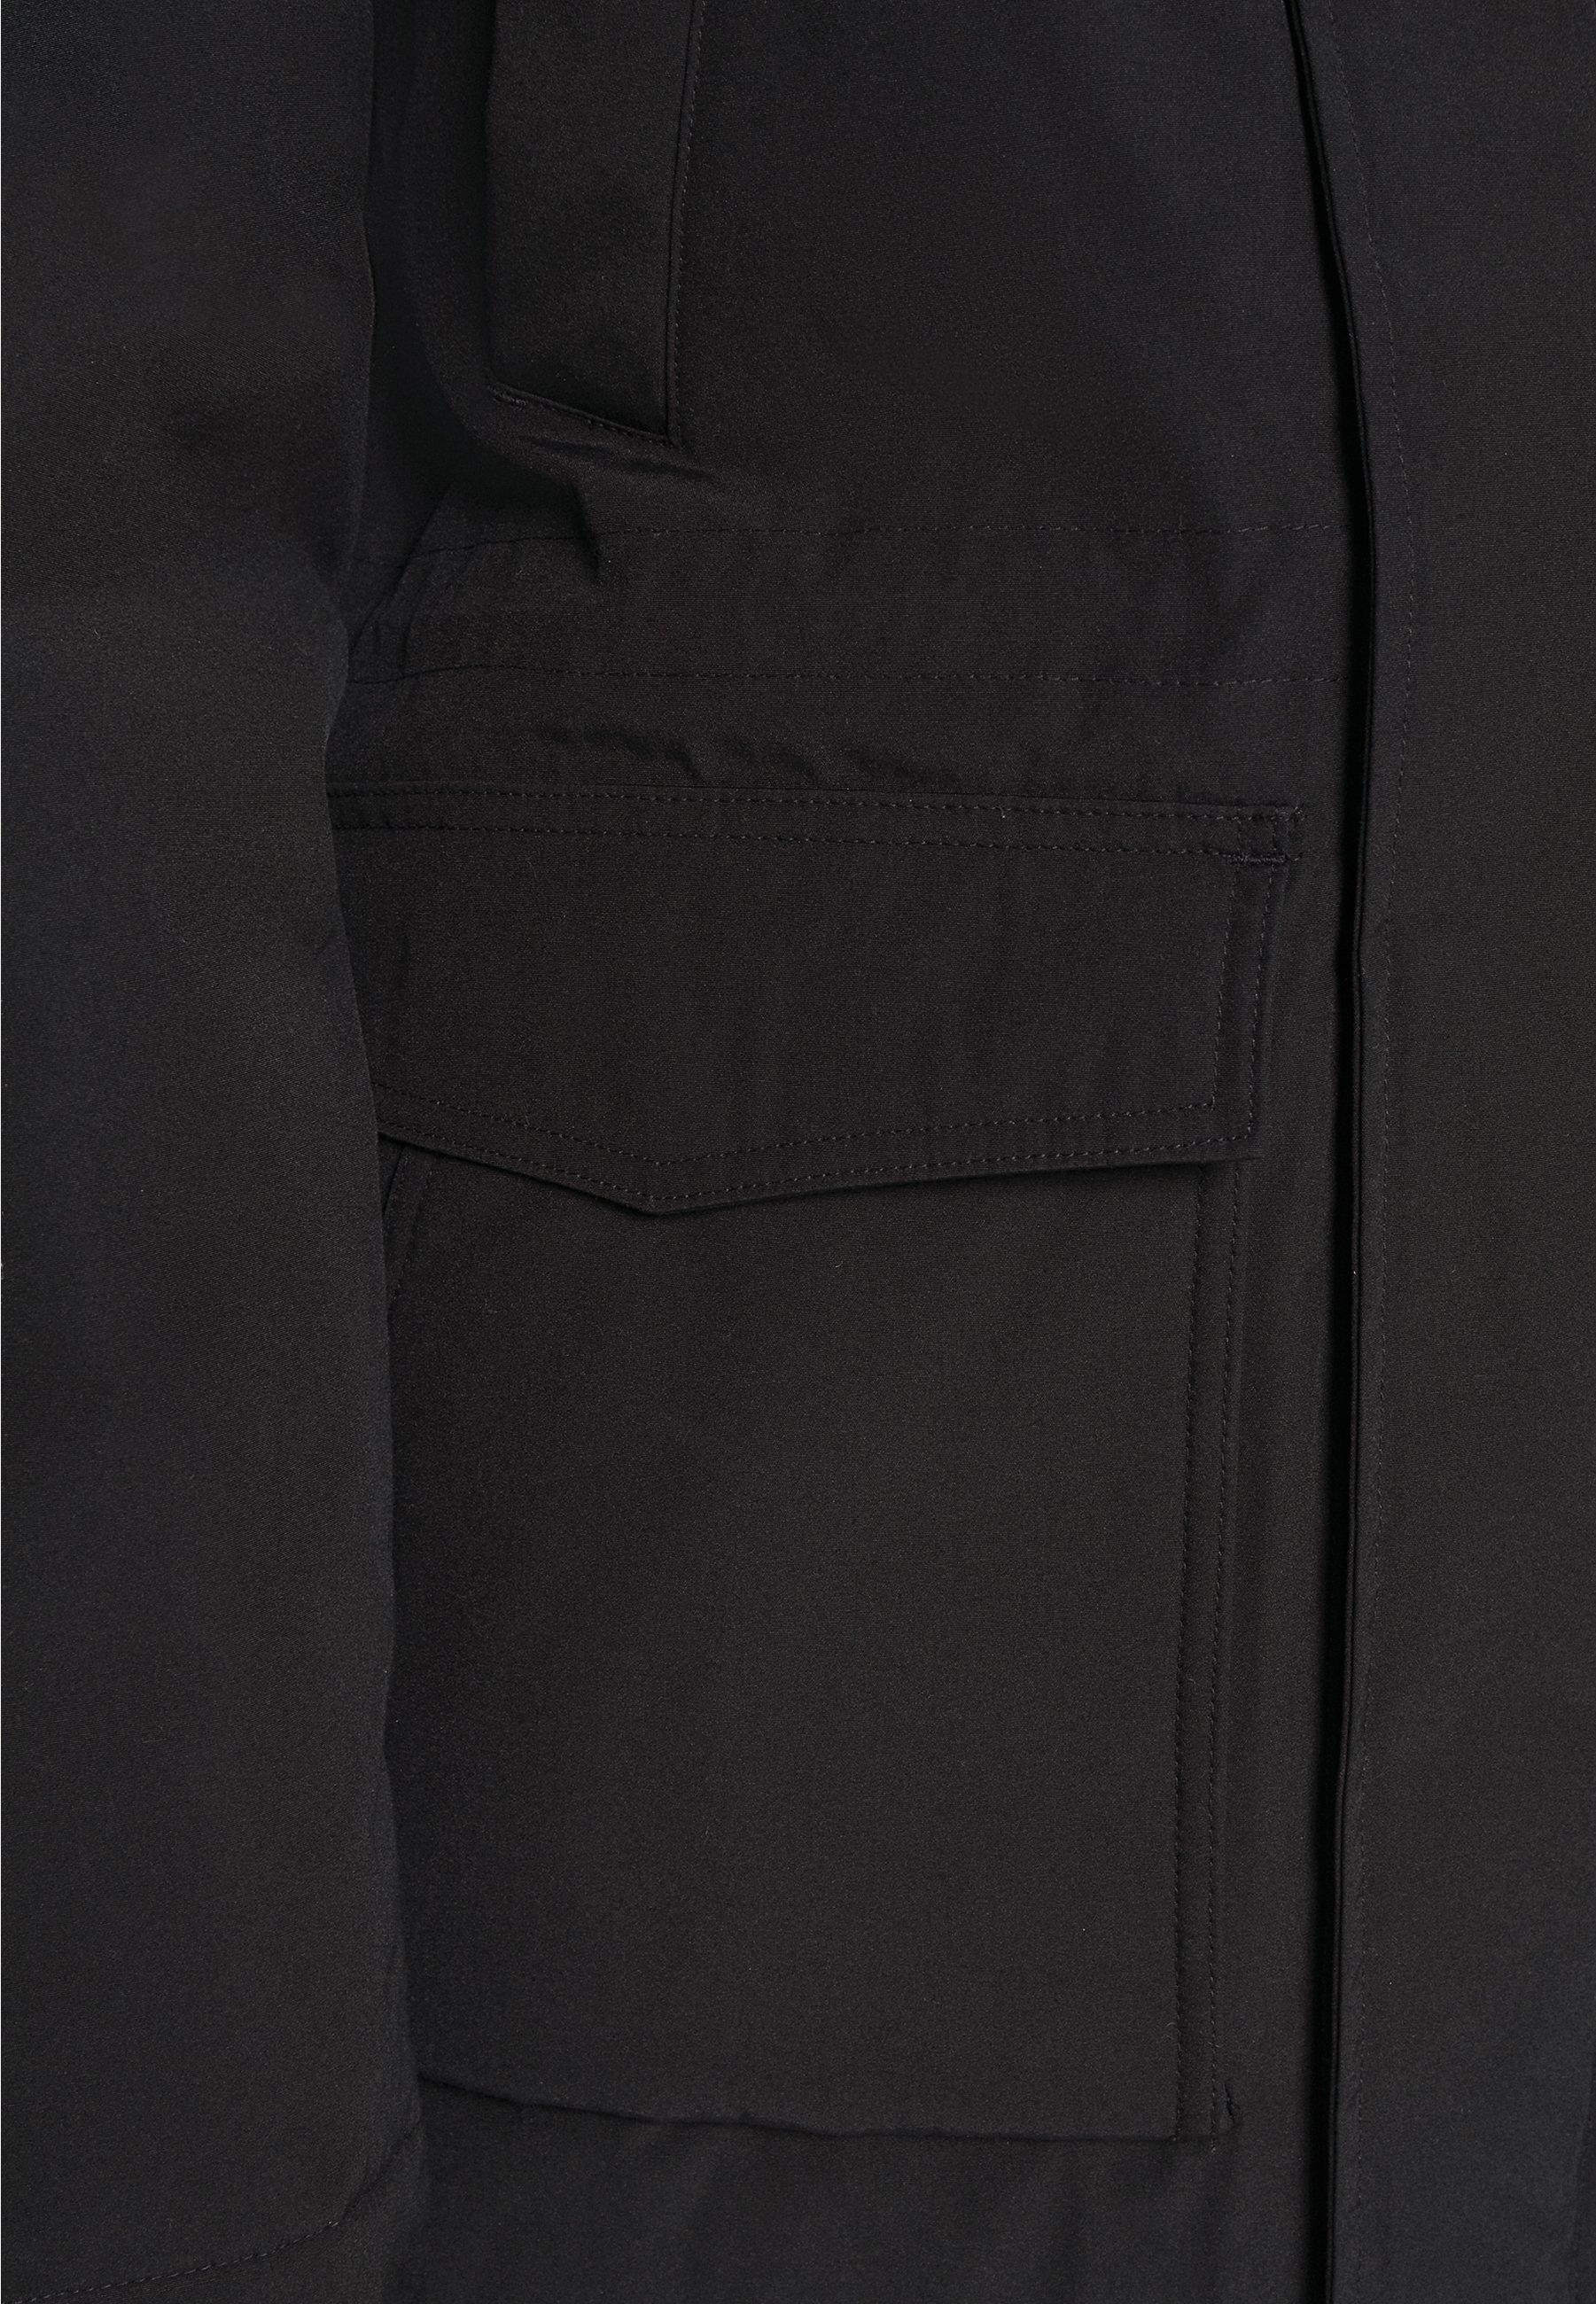 Carhartt WIP VAIL Übergangsjacke black/schwarz